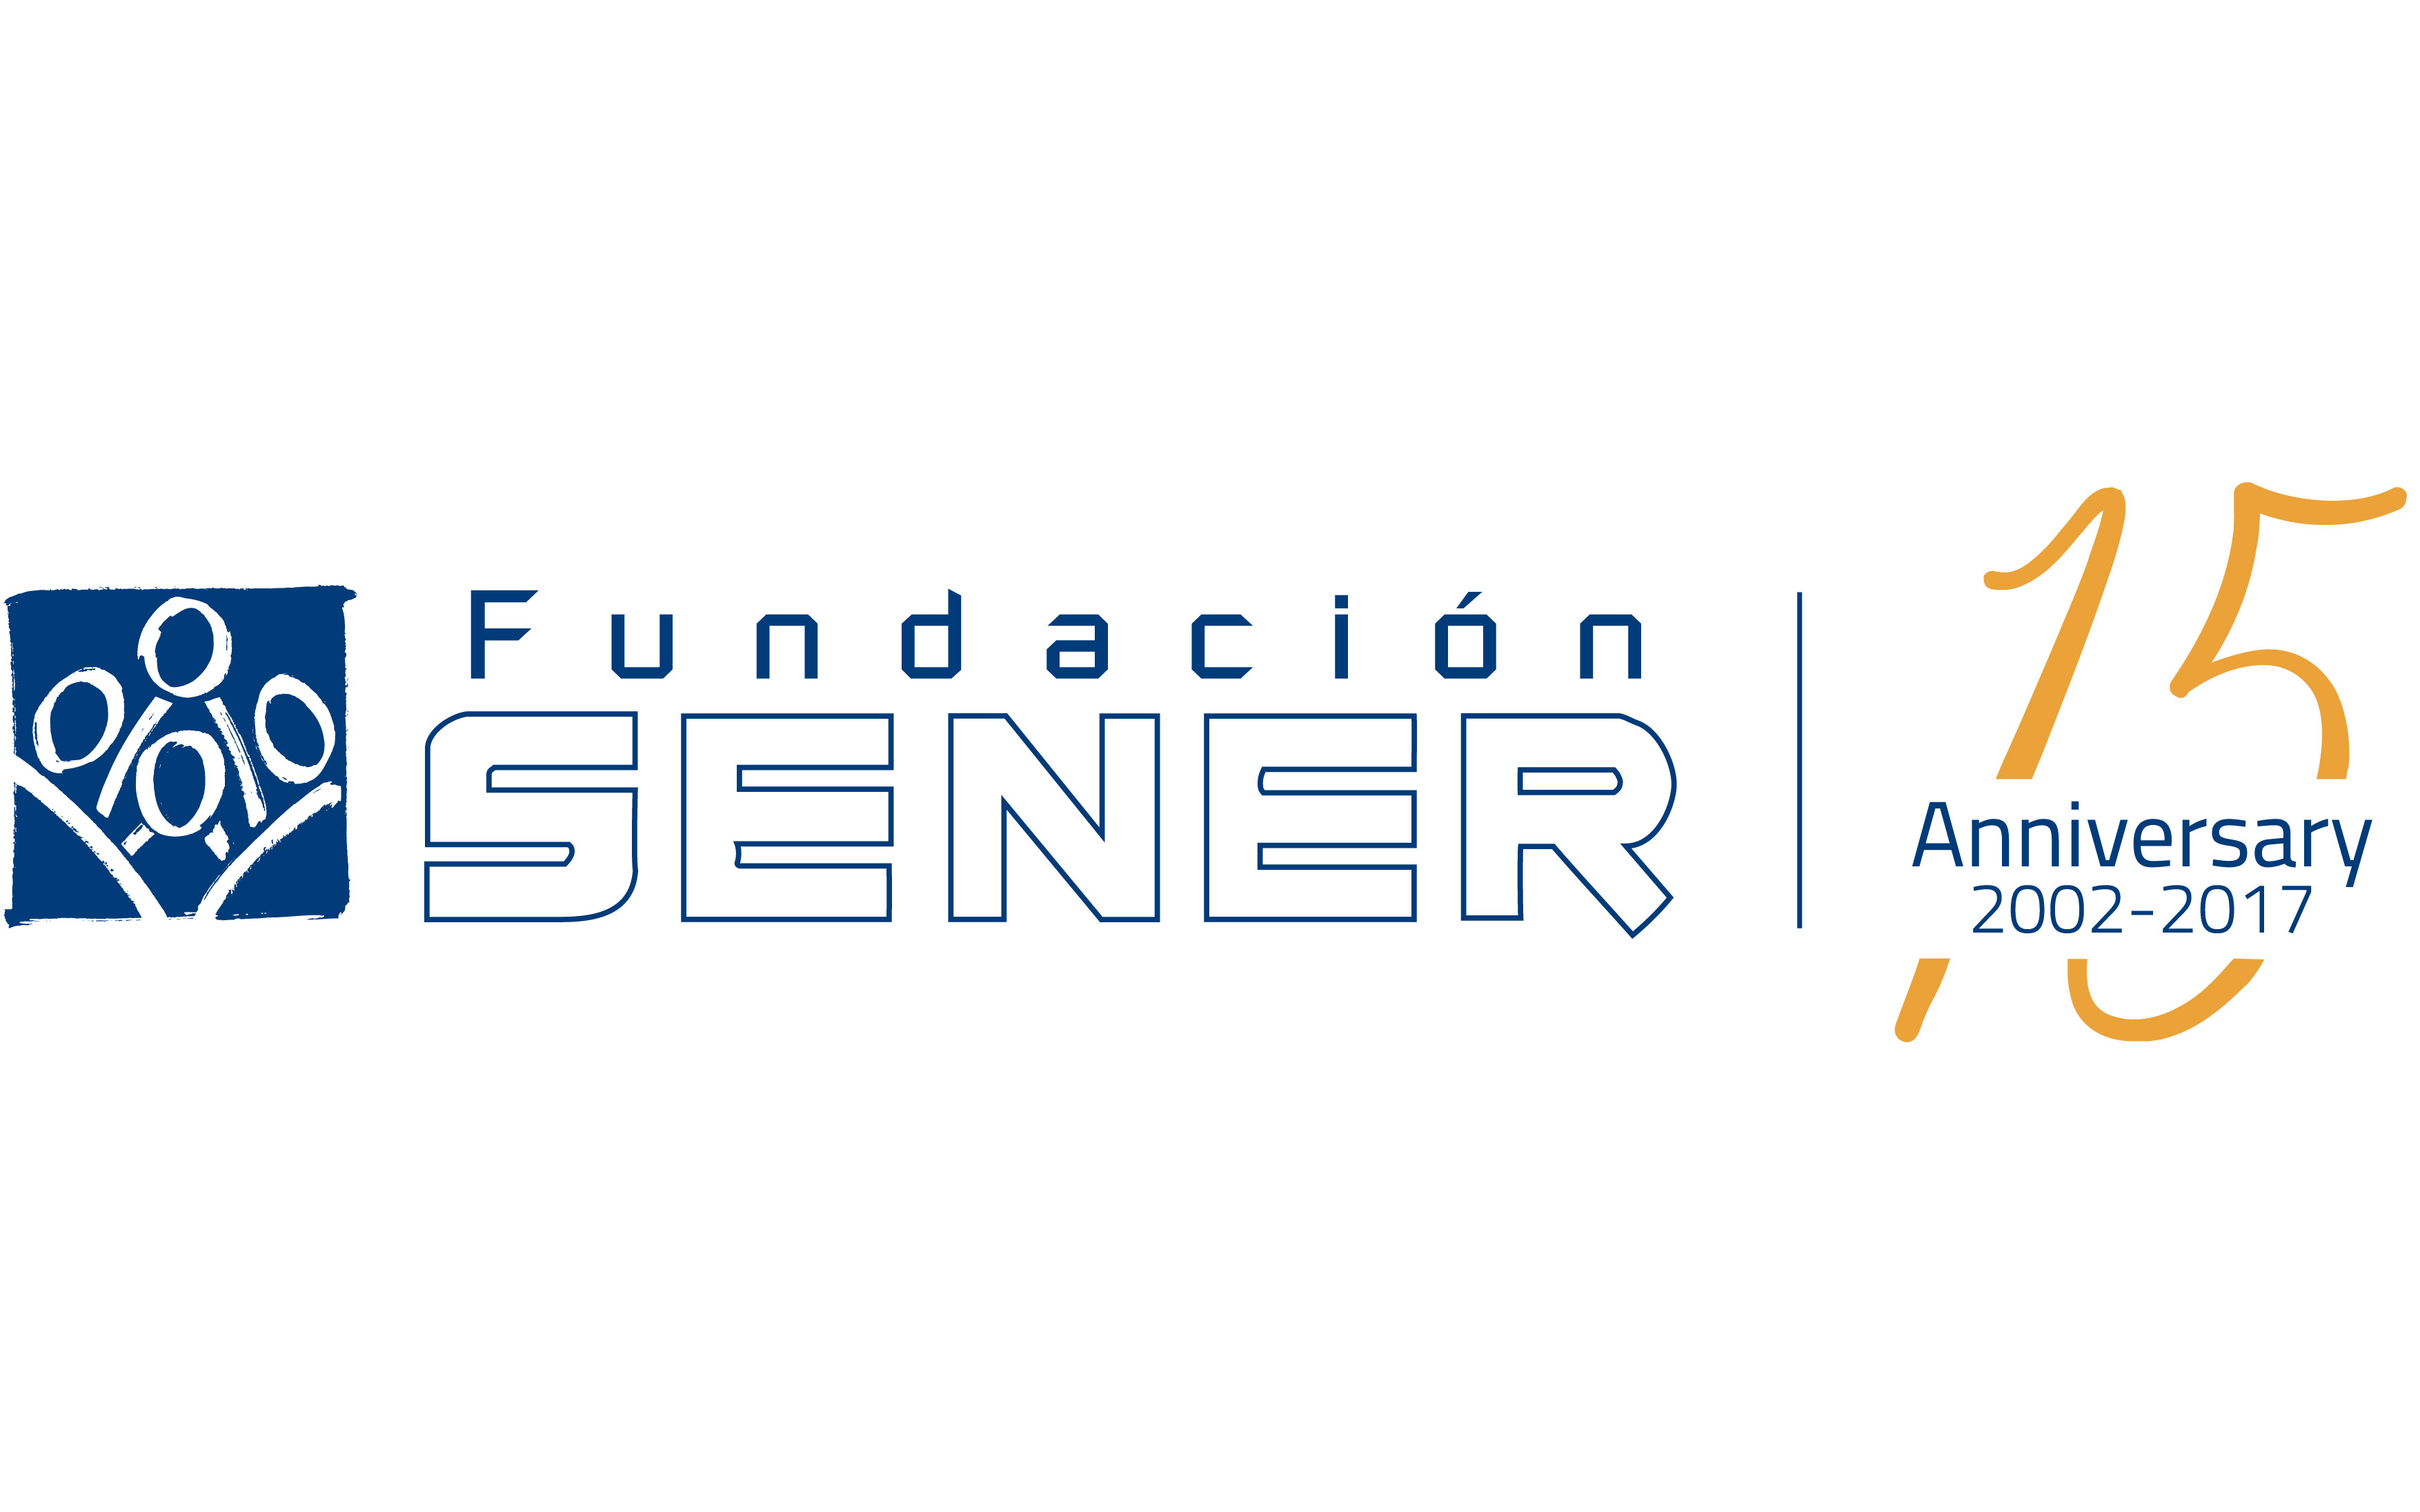 http://prod-plat-senerv3.yunbit.es/ecm-images/fundacion-sener-15-aniversario-1_replica_replica